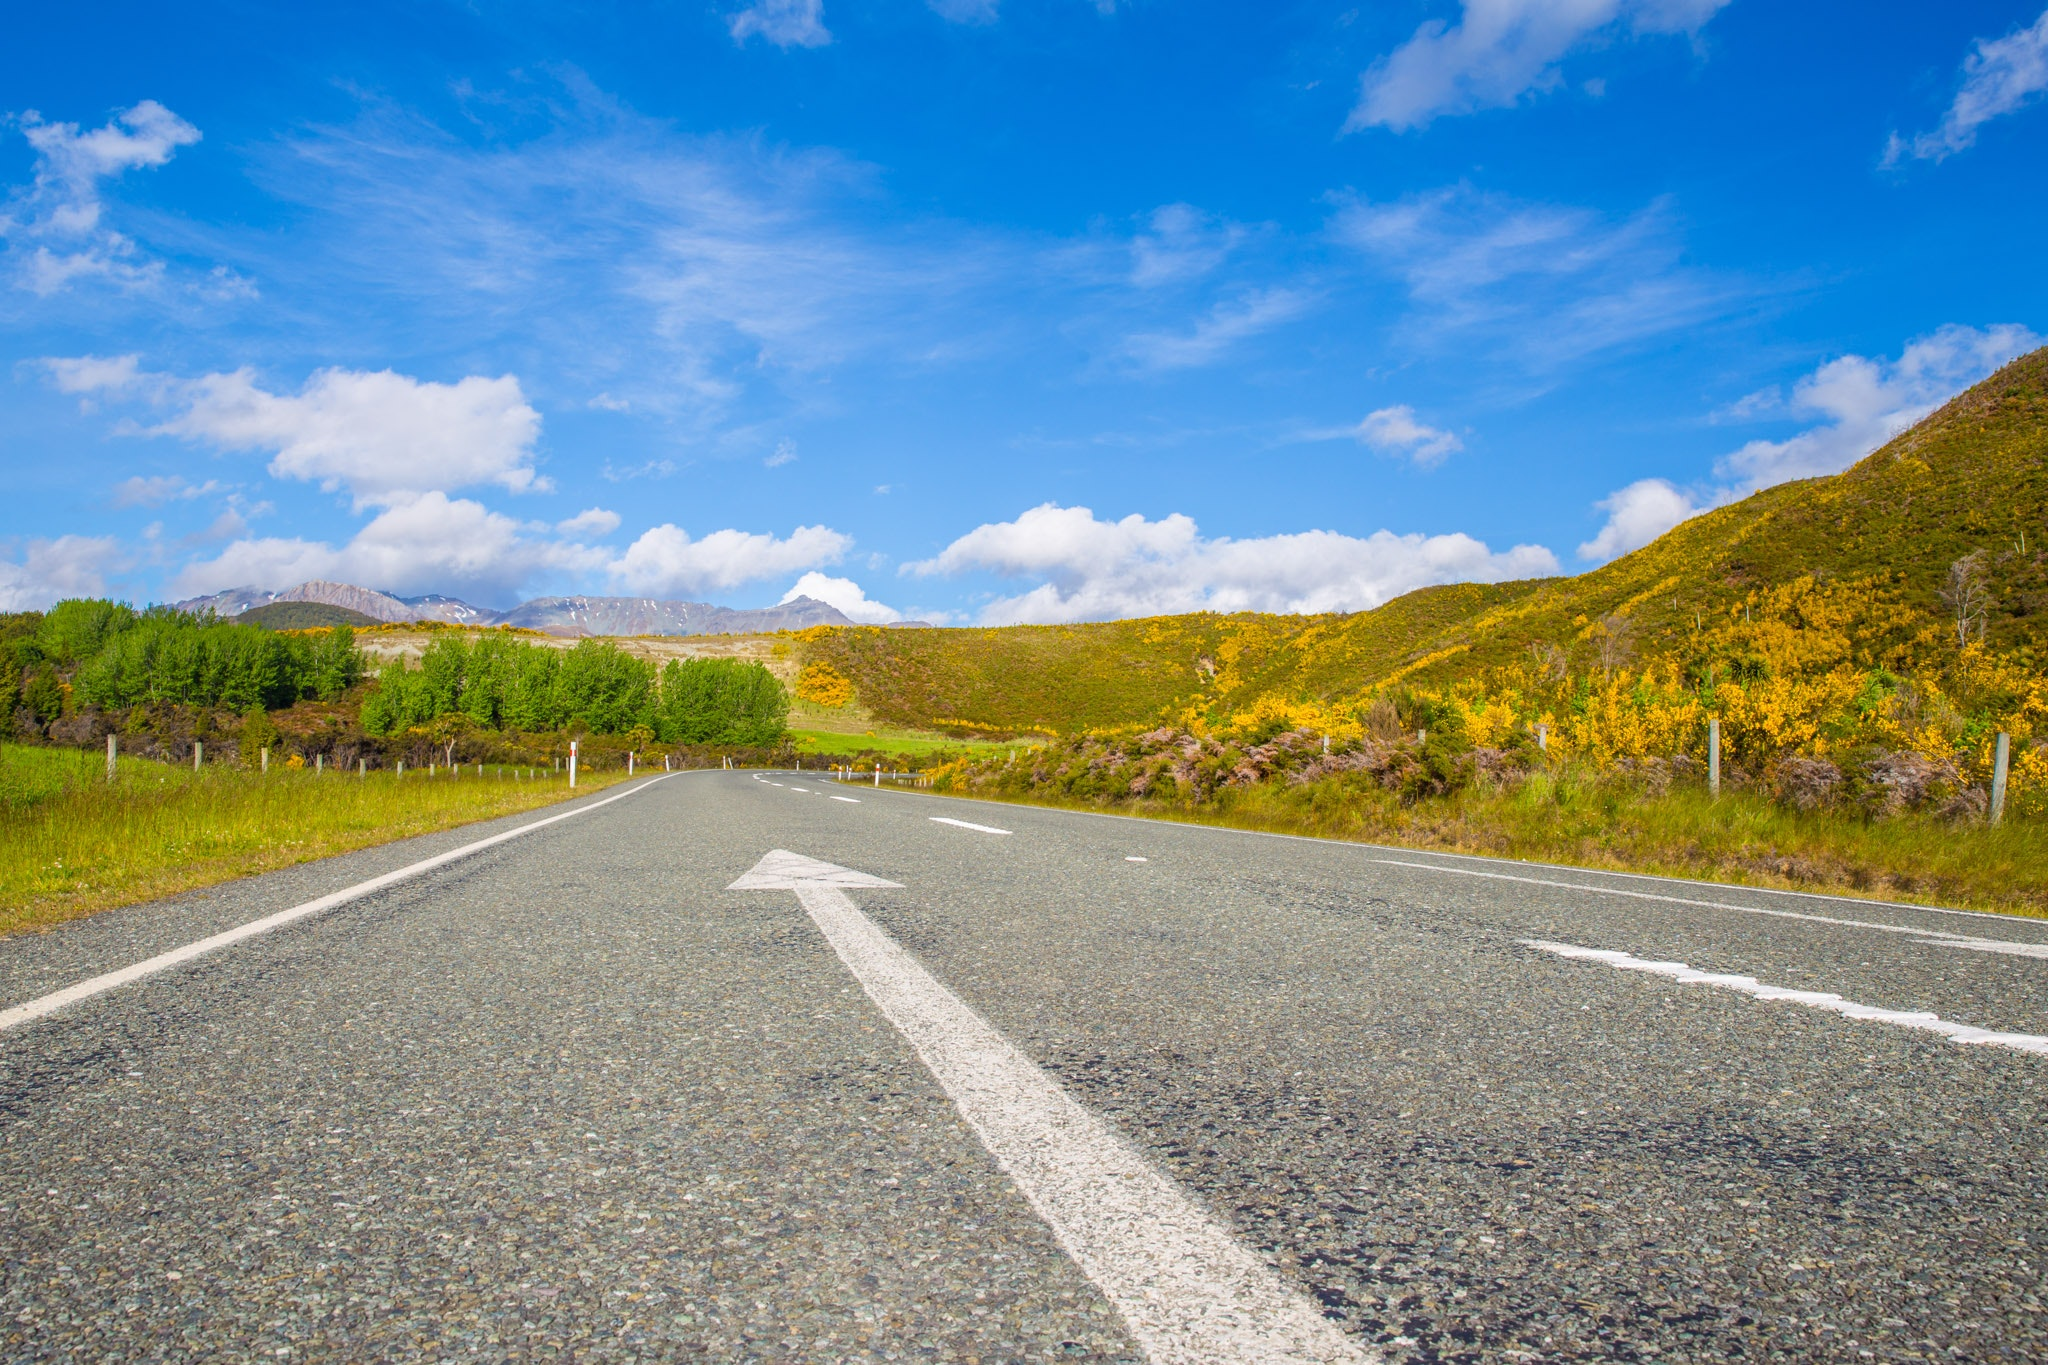 Road passing through landscape against blue sky photo